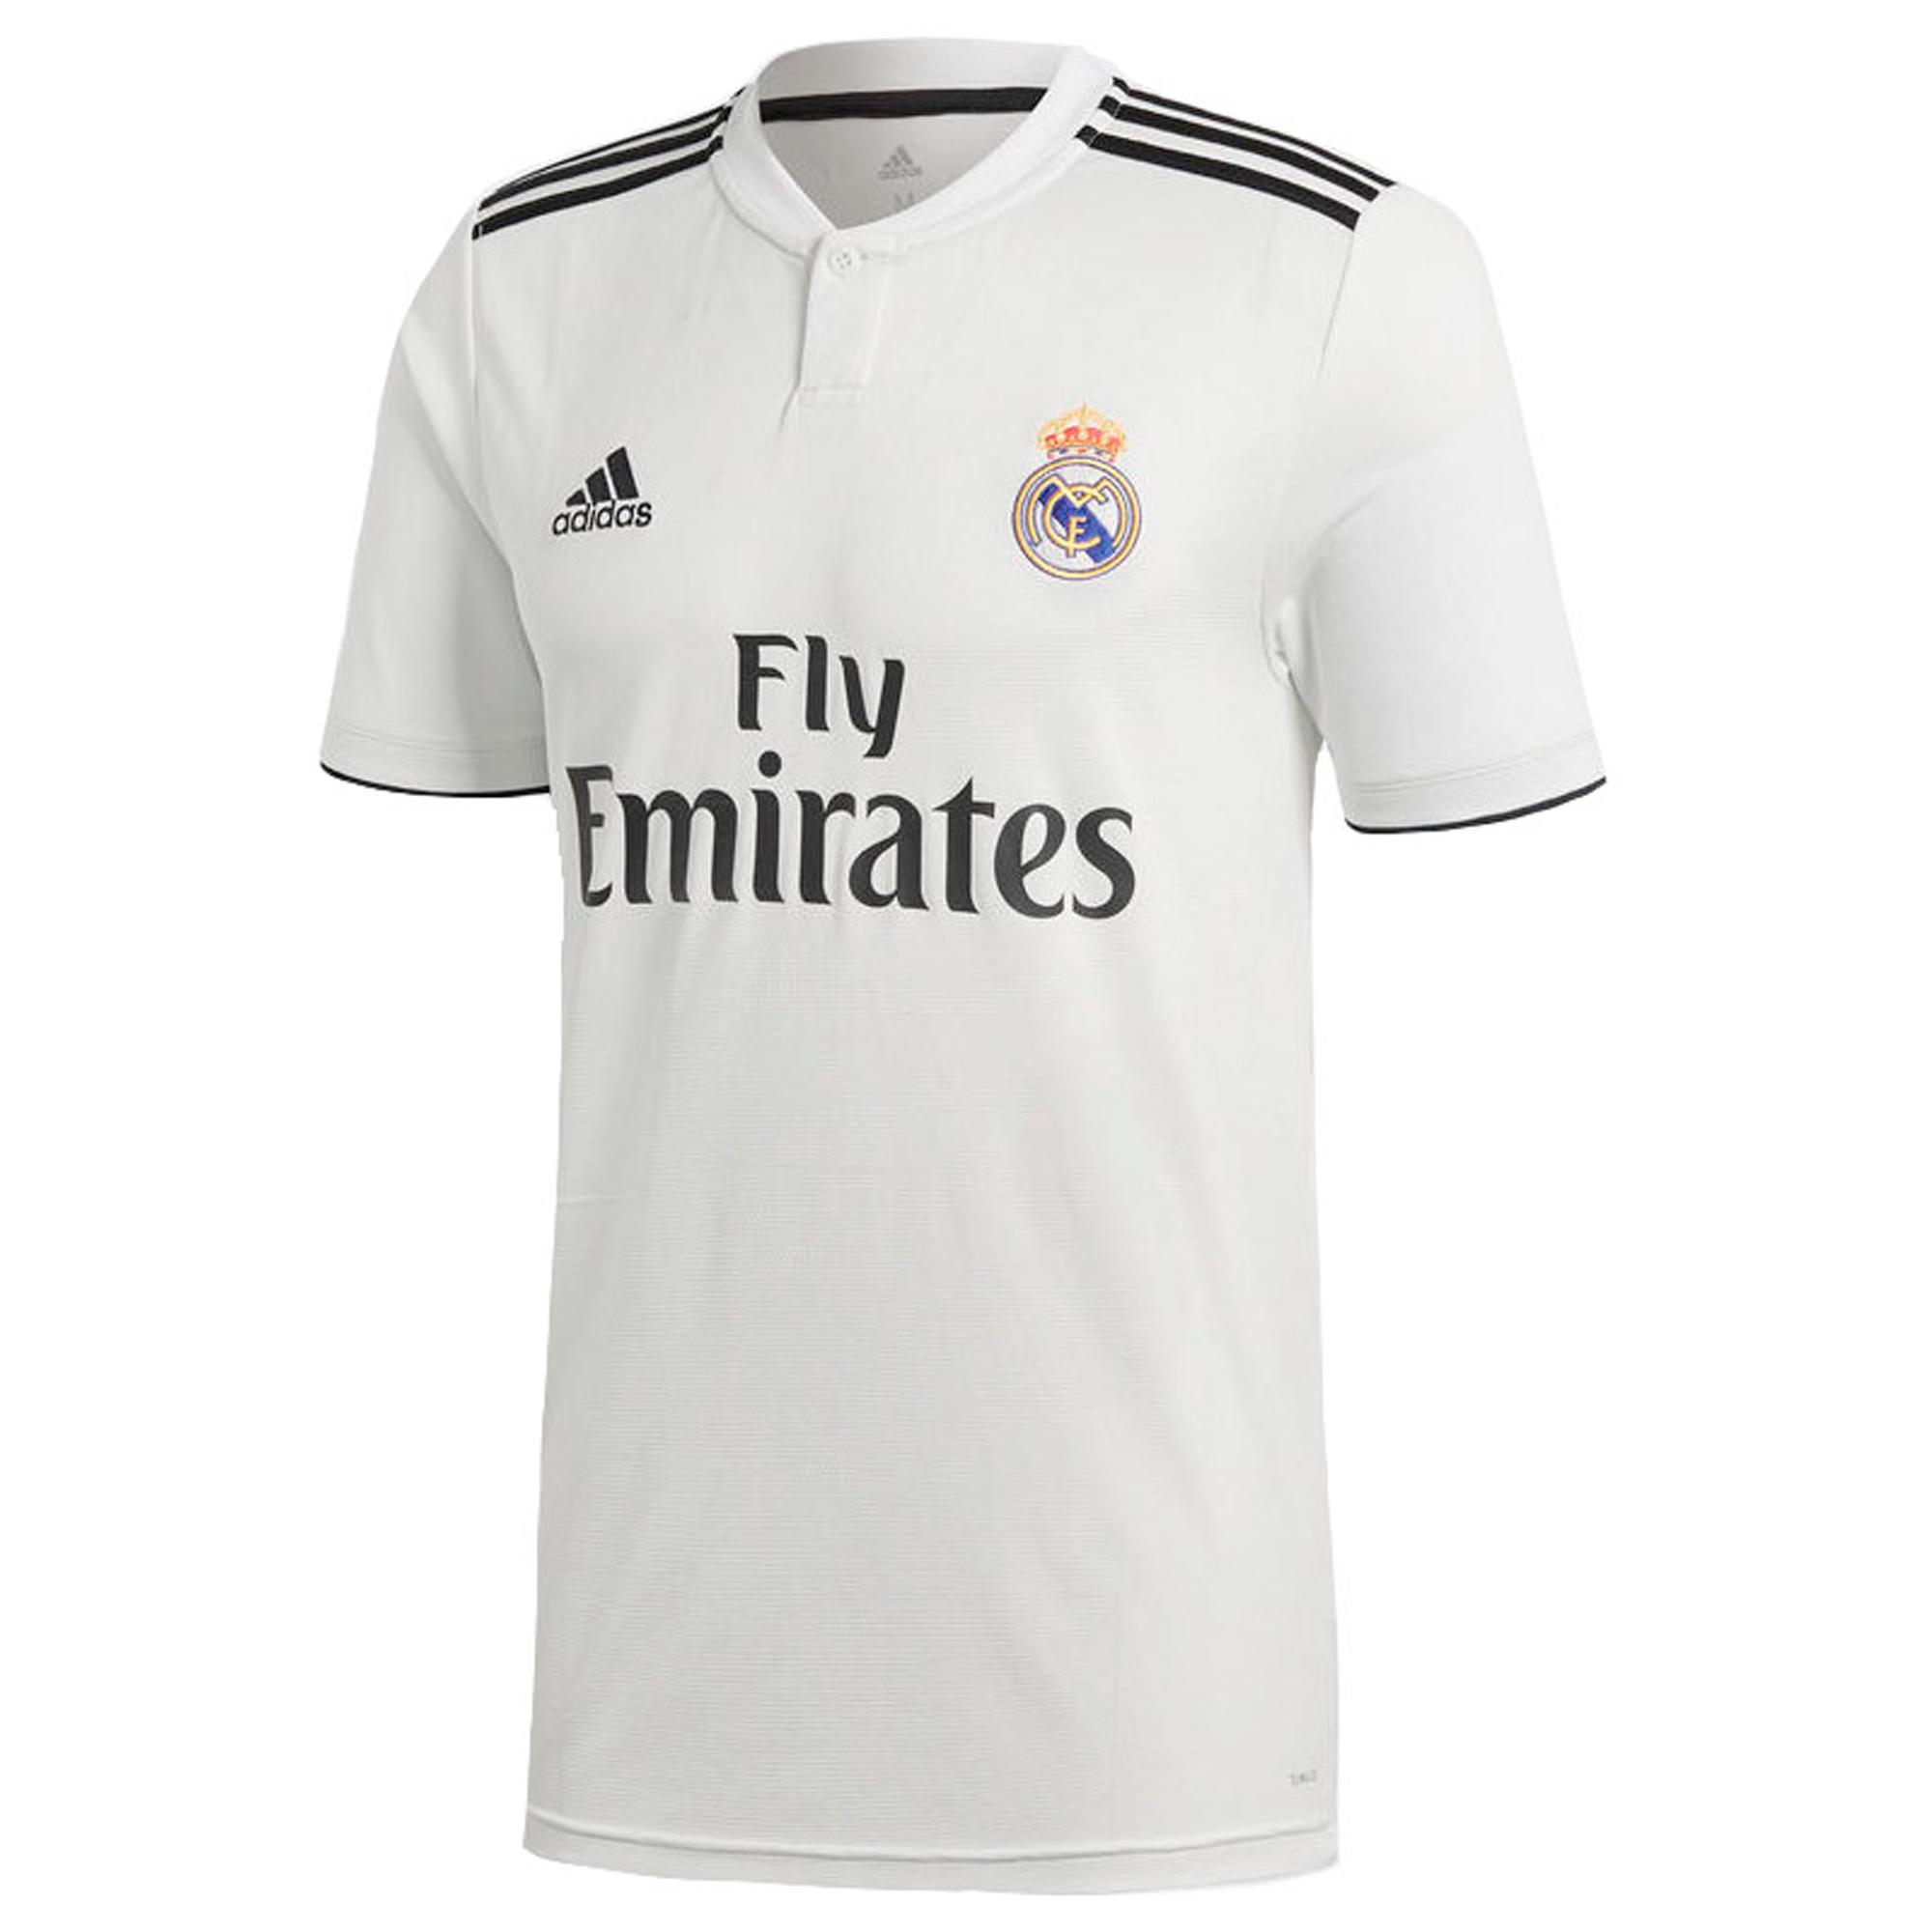 Kids Football Shirt Real Madrid Home Replica White 18 19 Adidas Decathlon